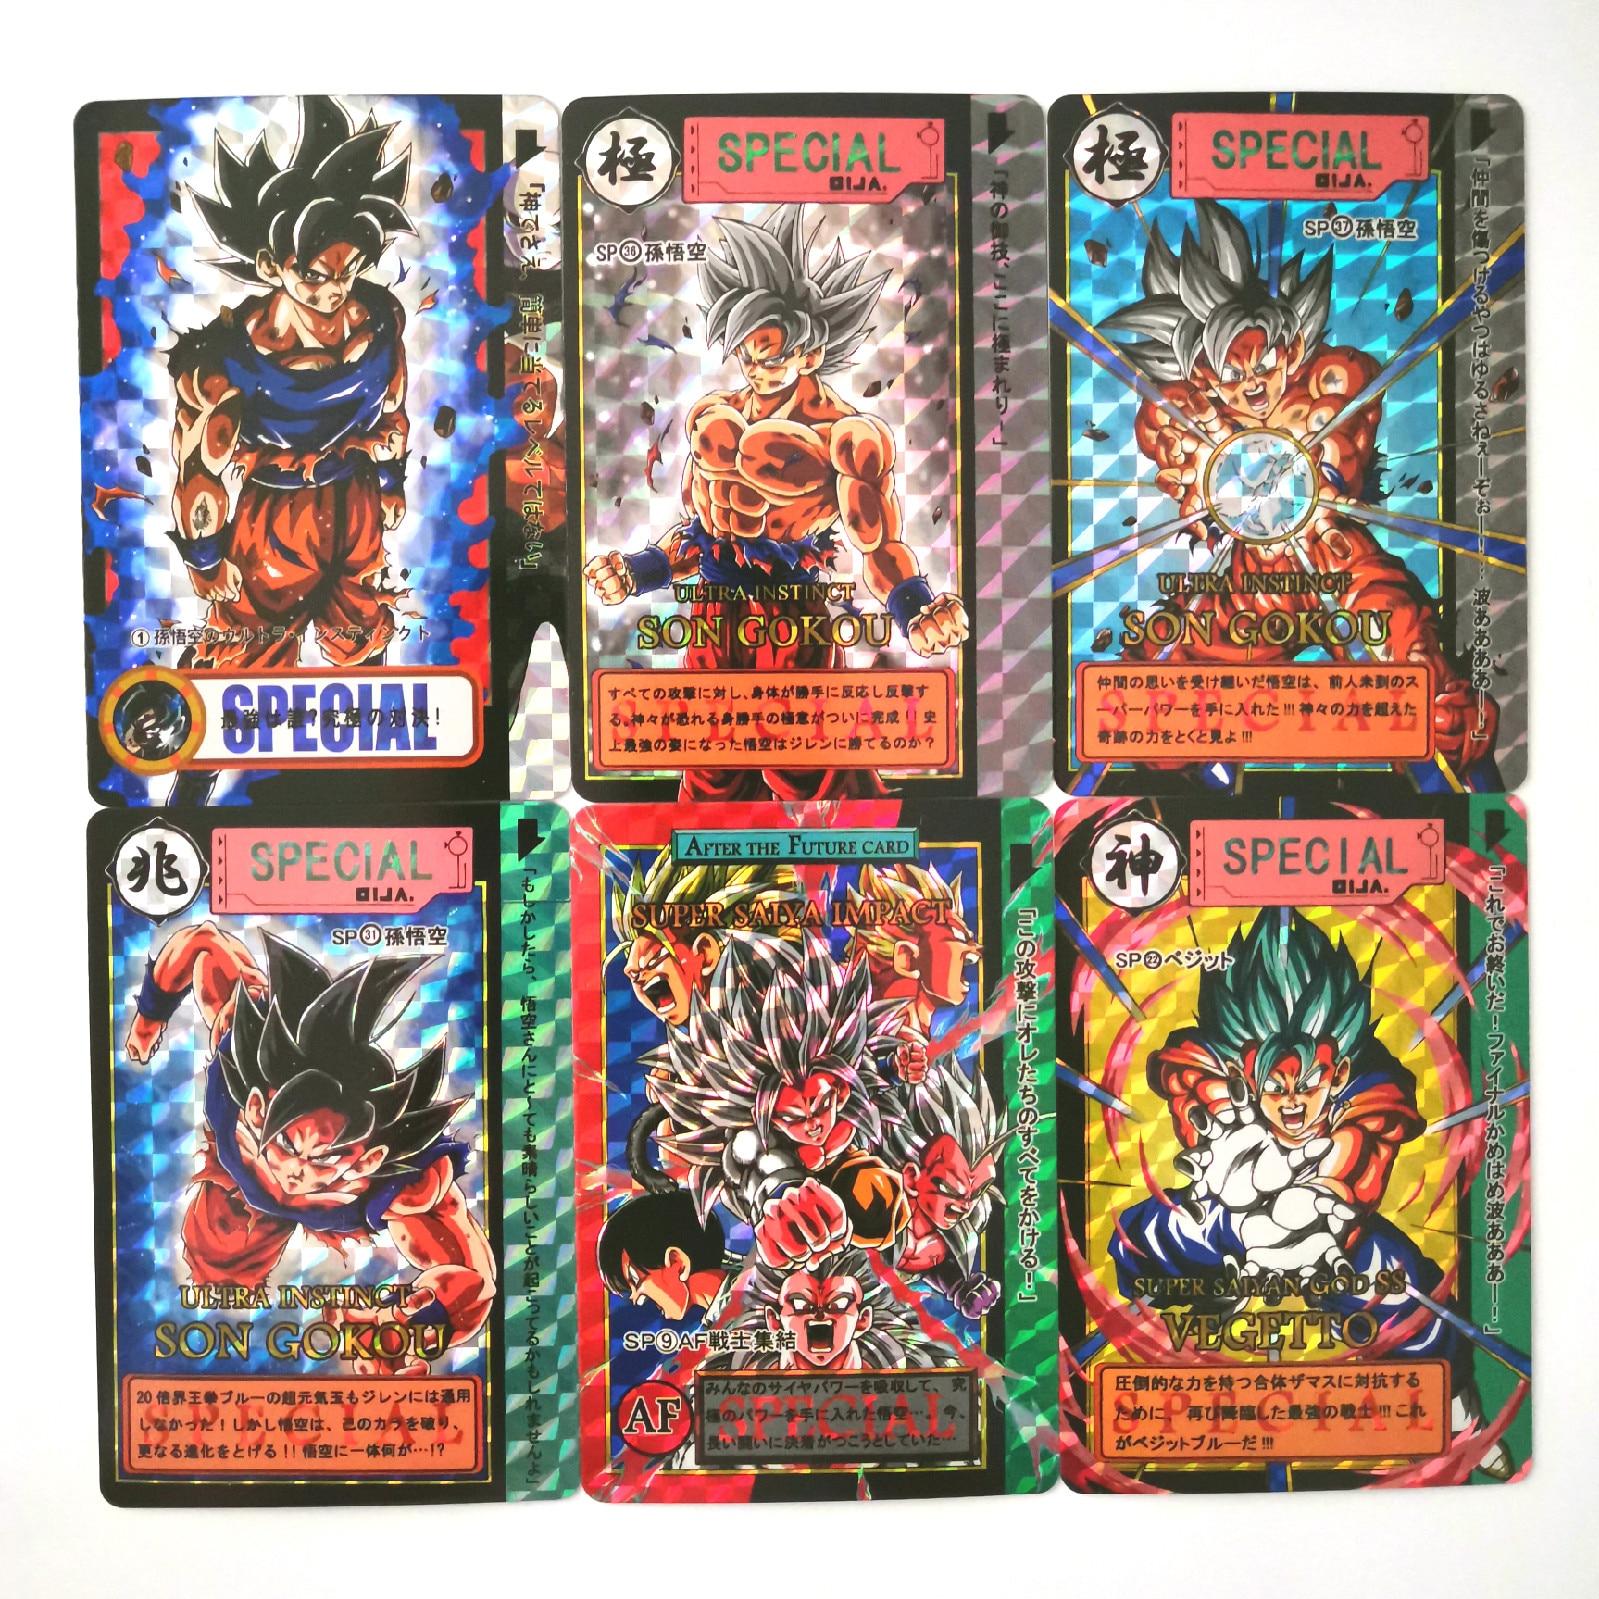 43pcs/set Super Dragon Ball Limit Breakthrough Heroes Battle Card Ultra Instinct Goku Game Collection Cards